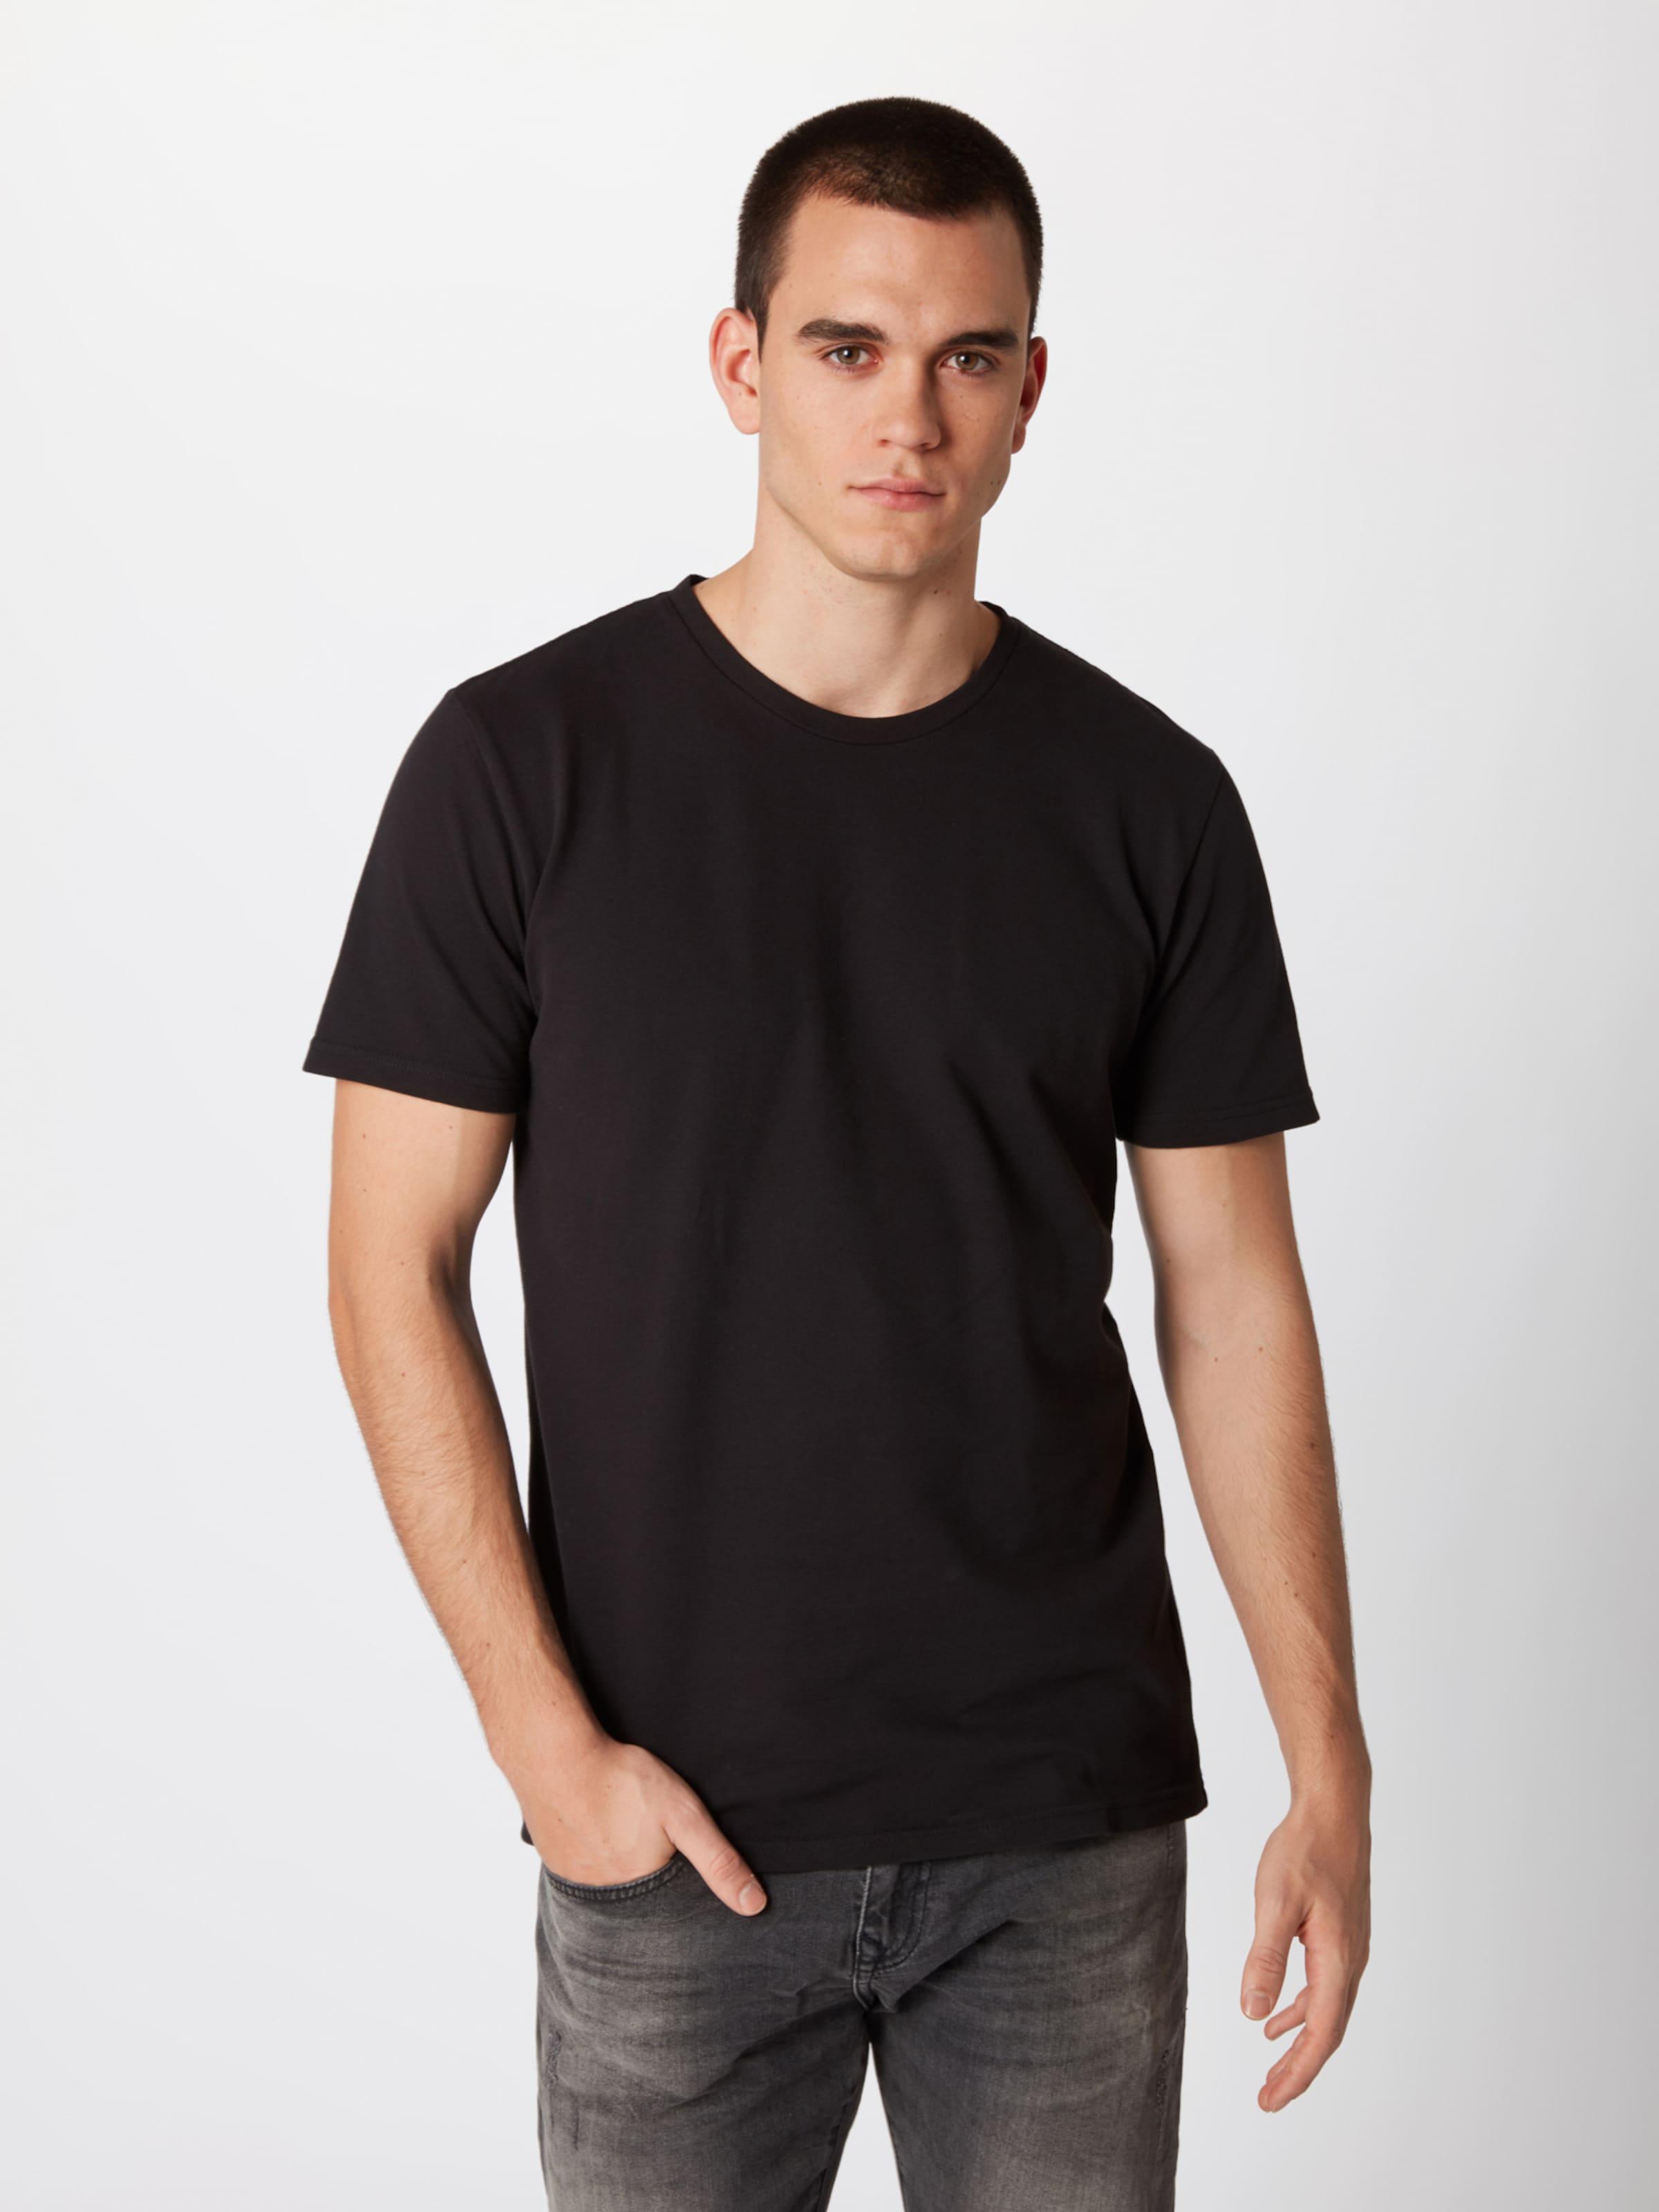 shirt Drykorn Noir T En 'samuel' ordCBWxe